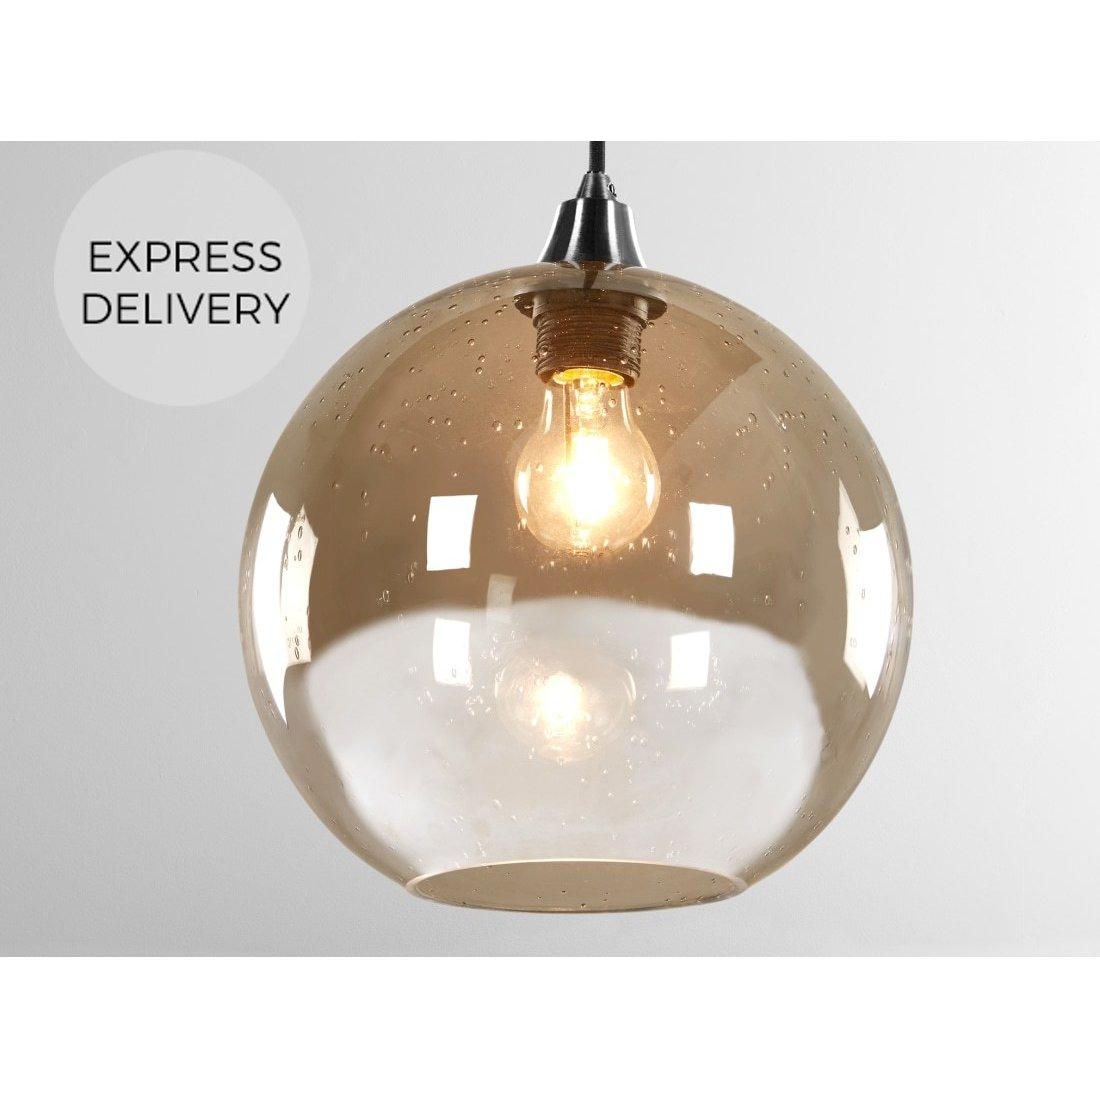 image-MADE Essentials Edna glass Easyfit lamp_Lamp Shade, Smoke Grey